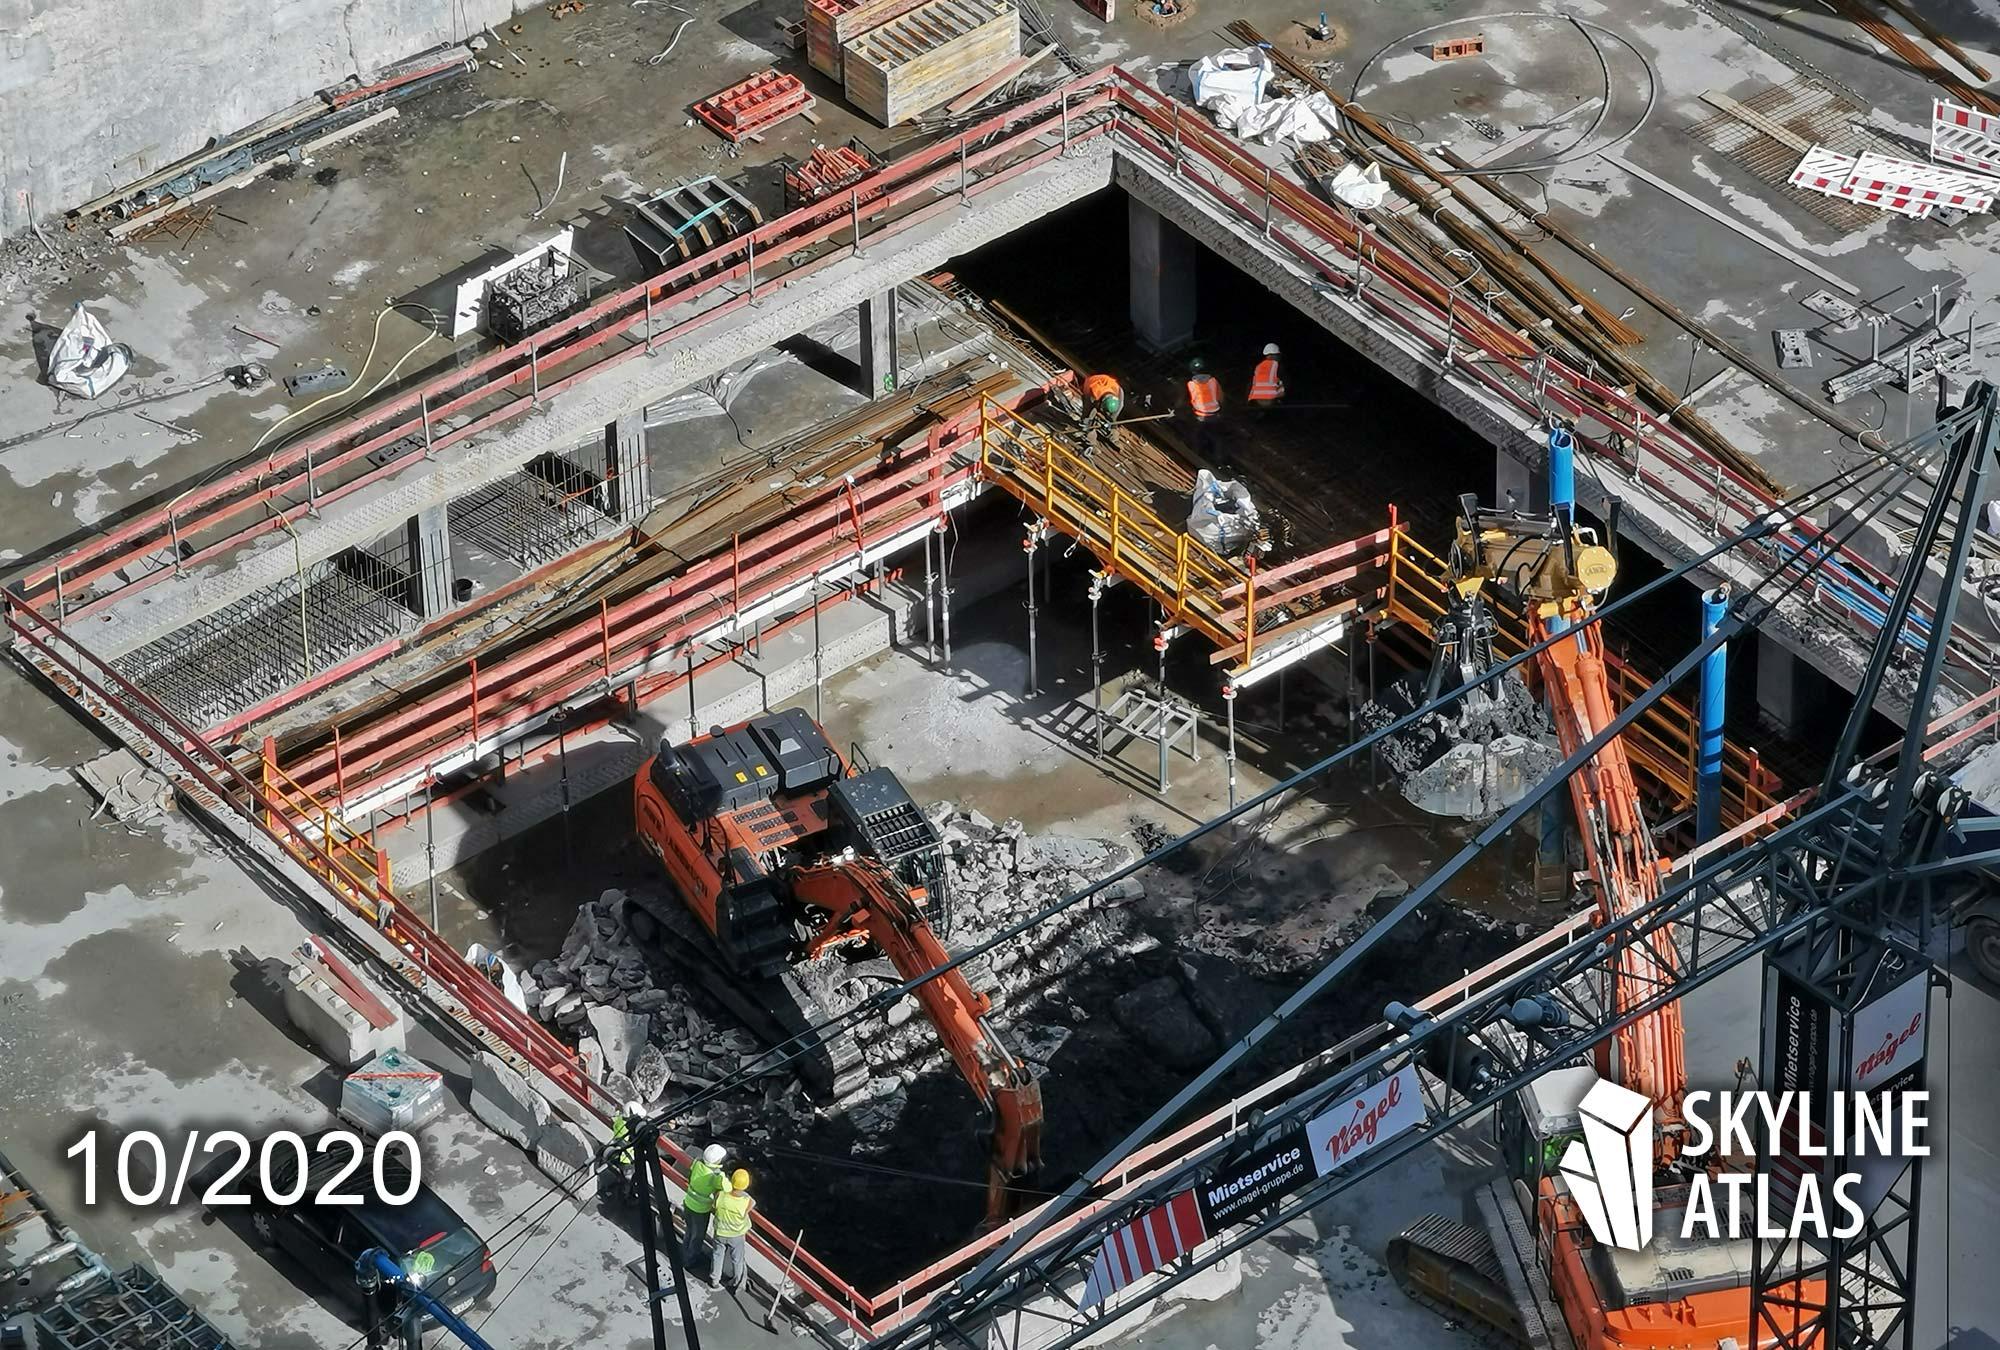 Baustelle FOUR Frankfurt im Herbst 2020